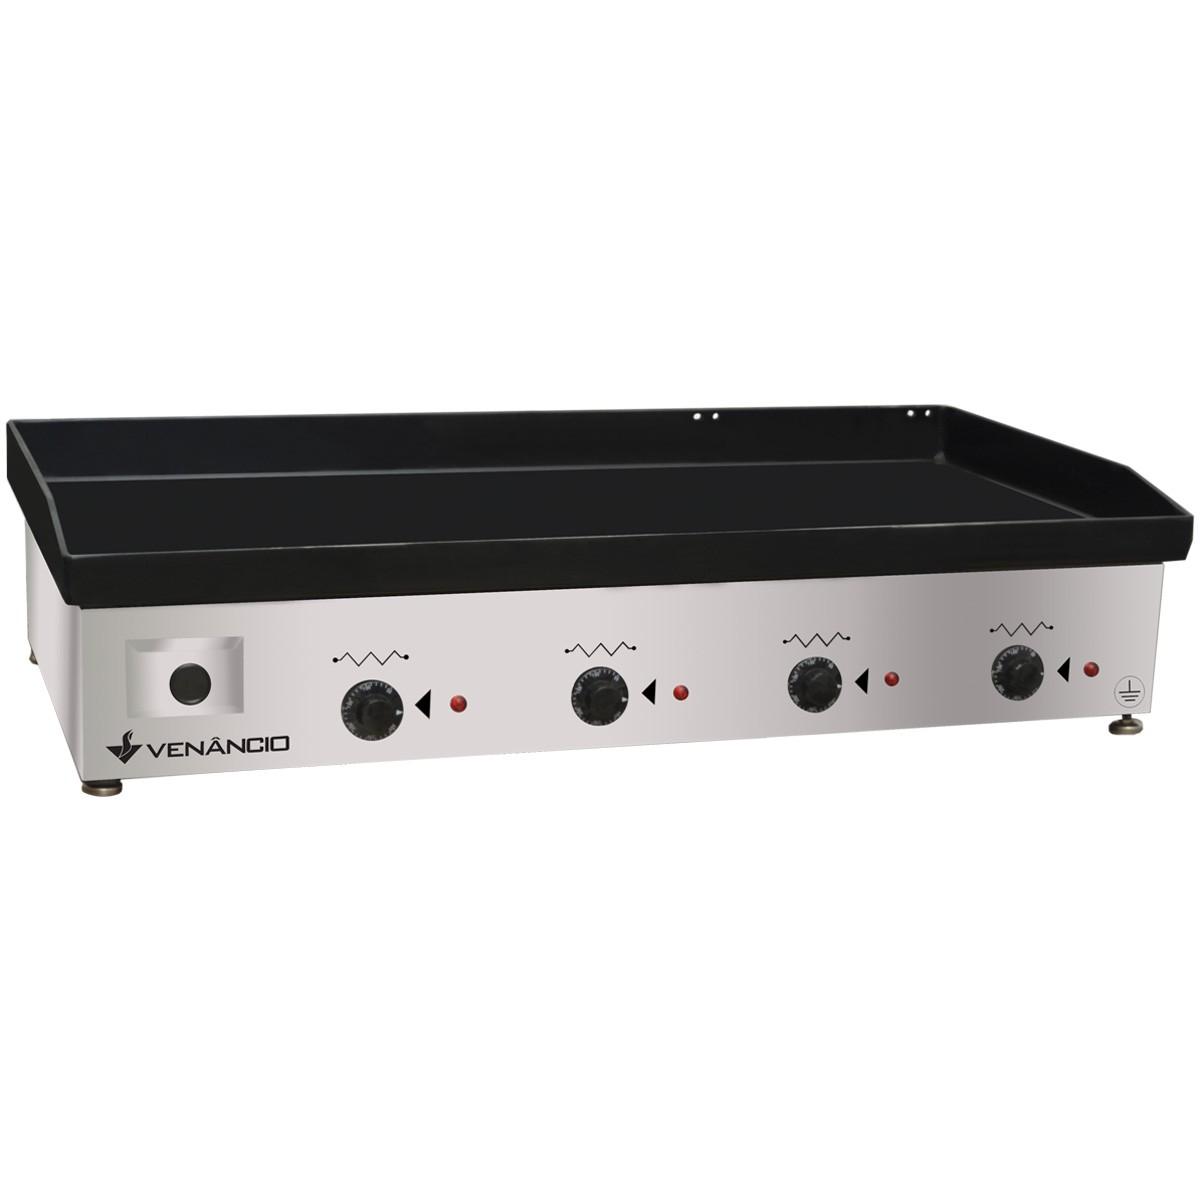 CHAPA ELET INOX ESCOV MOD 800-220V VENANCIO